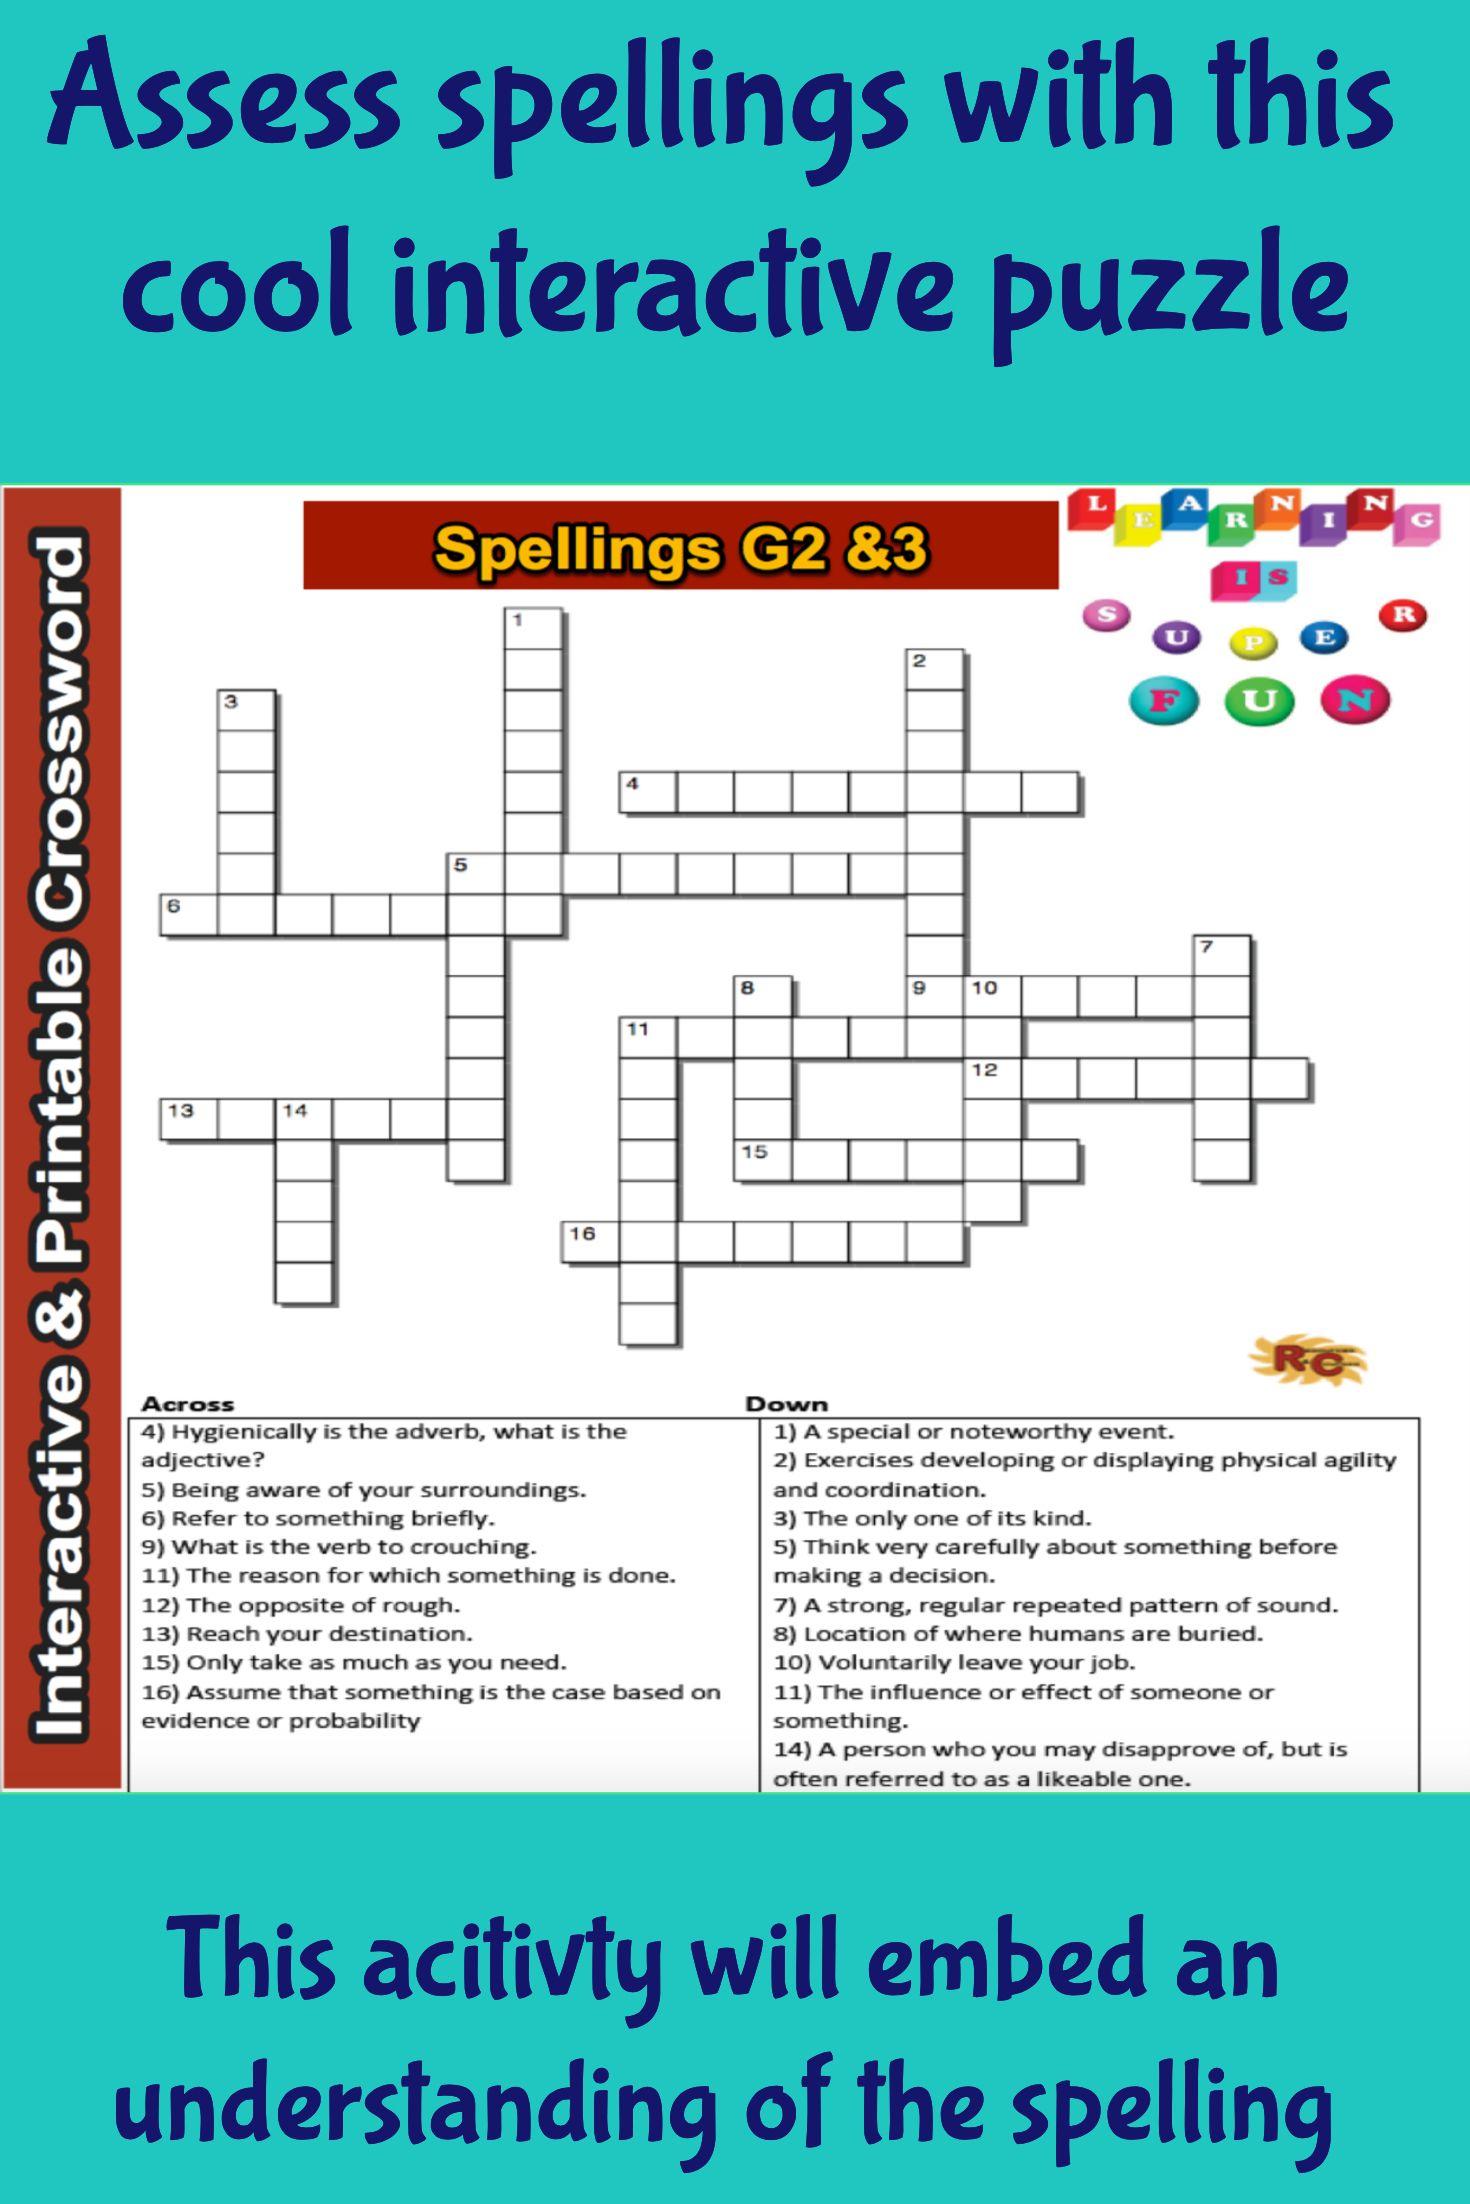 Spelling Grade 2&3 Interactive & Printable Crossword Puzzle | Word - Fun Crossword Puzzles Printable